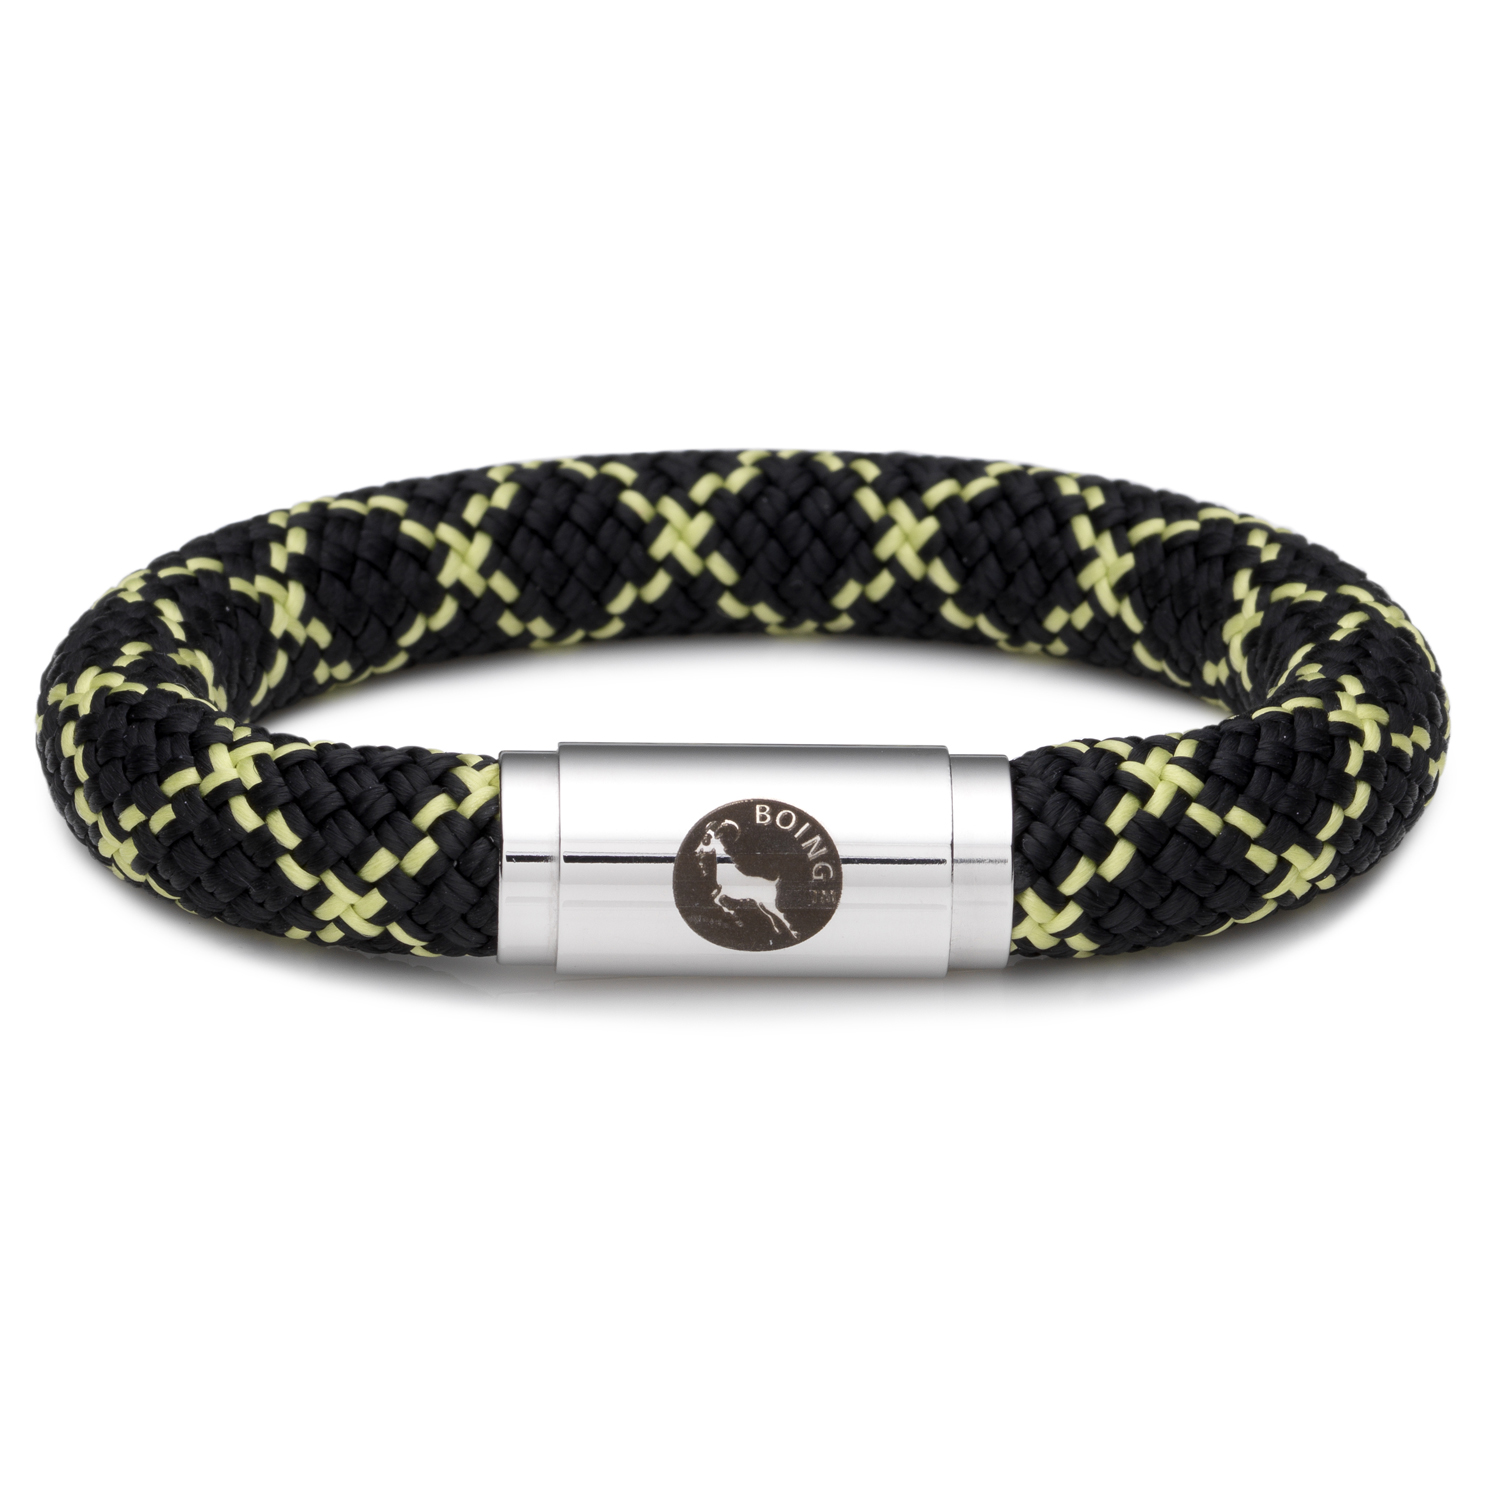 Boing – Chunky Large Wristband in Masai Black